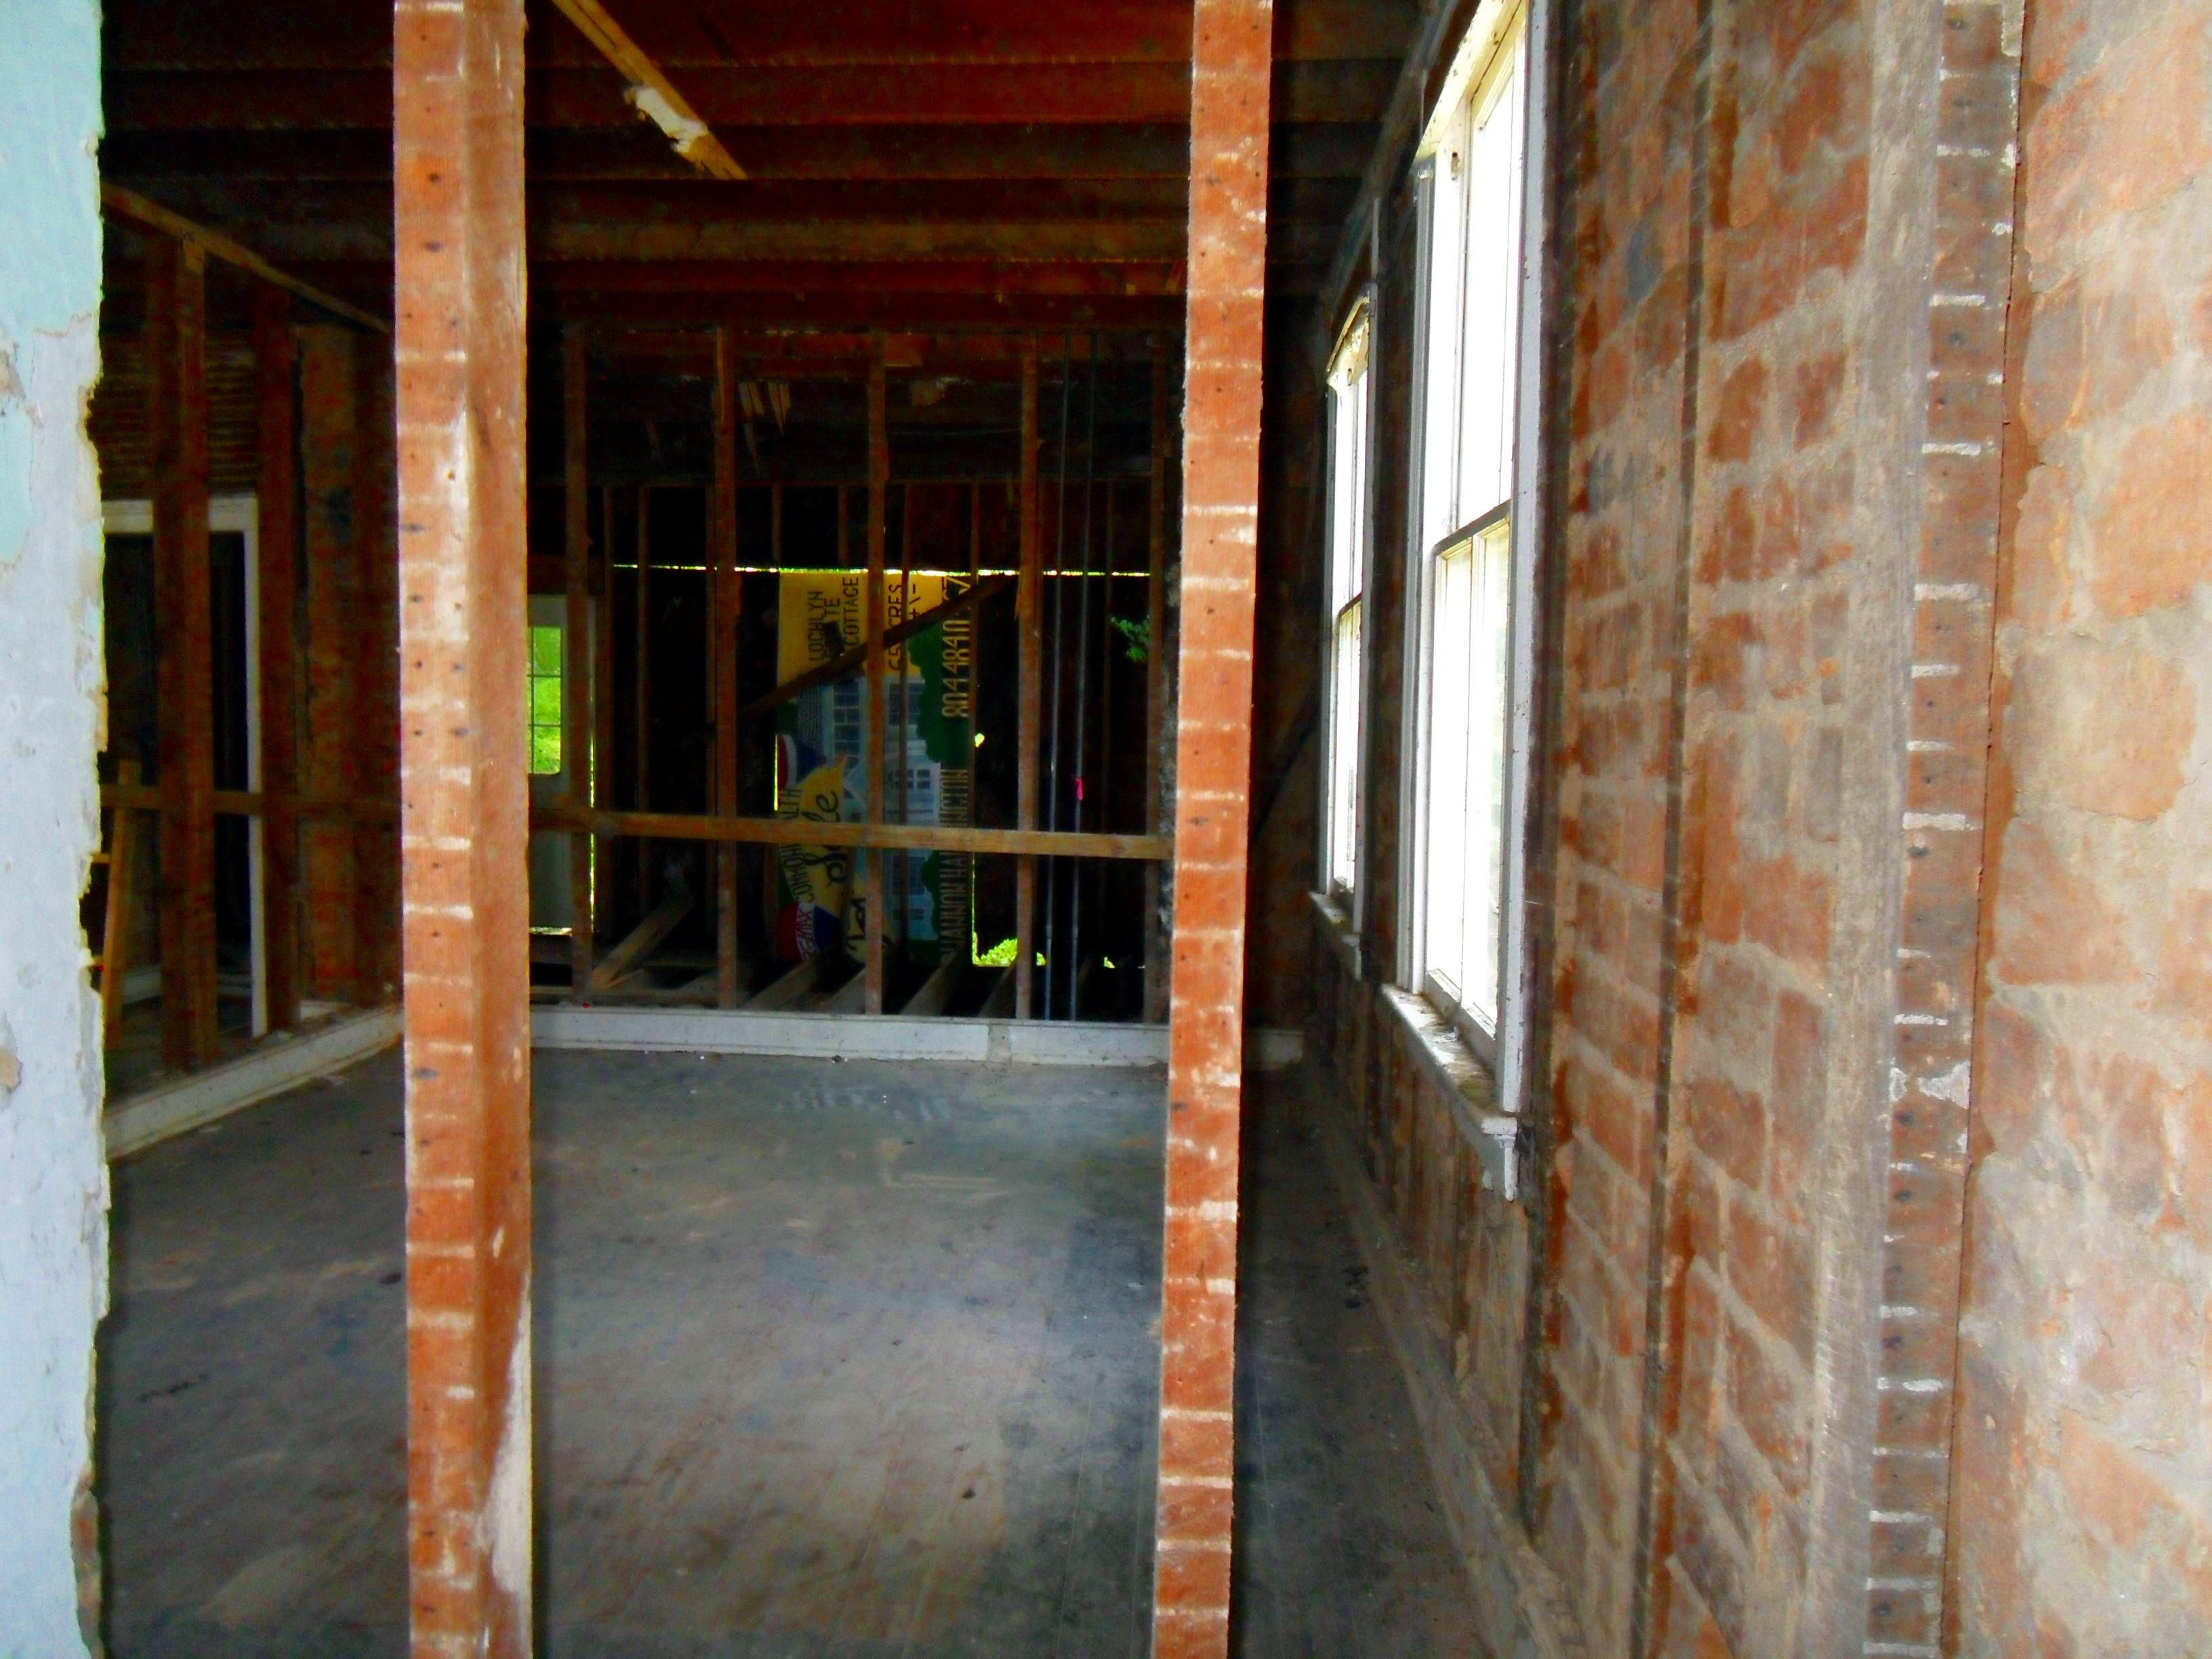 619 frederick st before renovation - kitchen